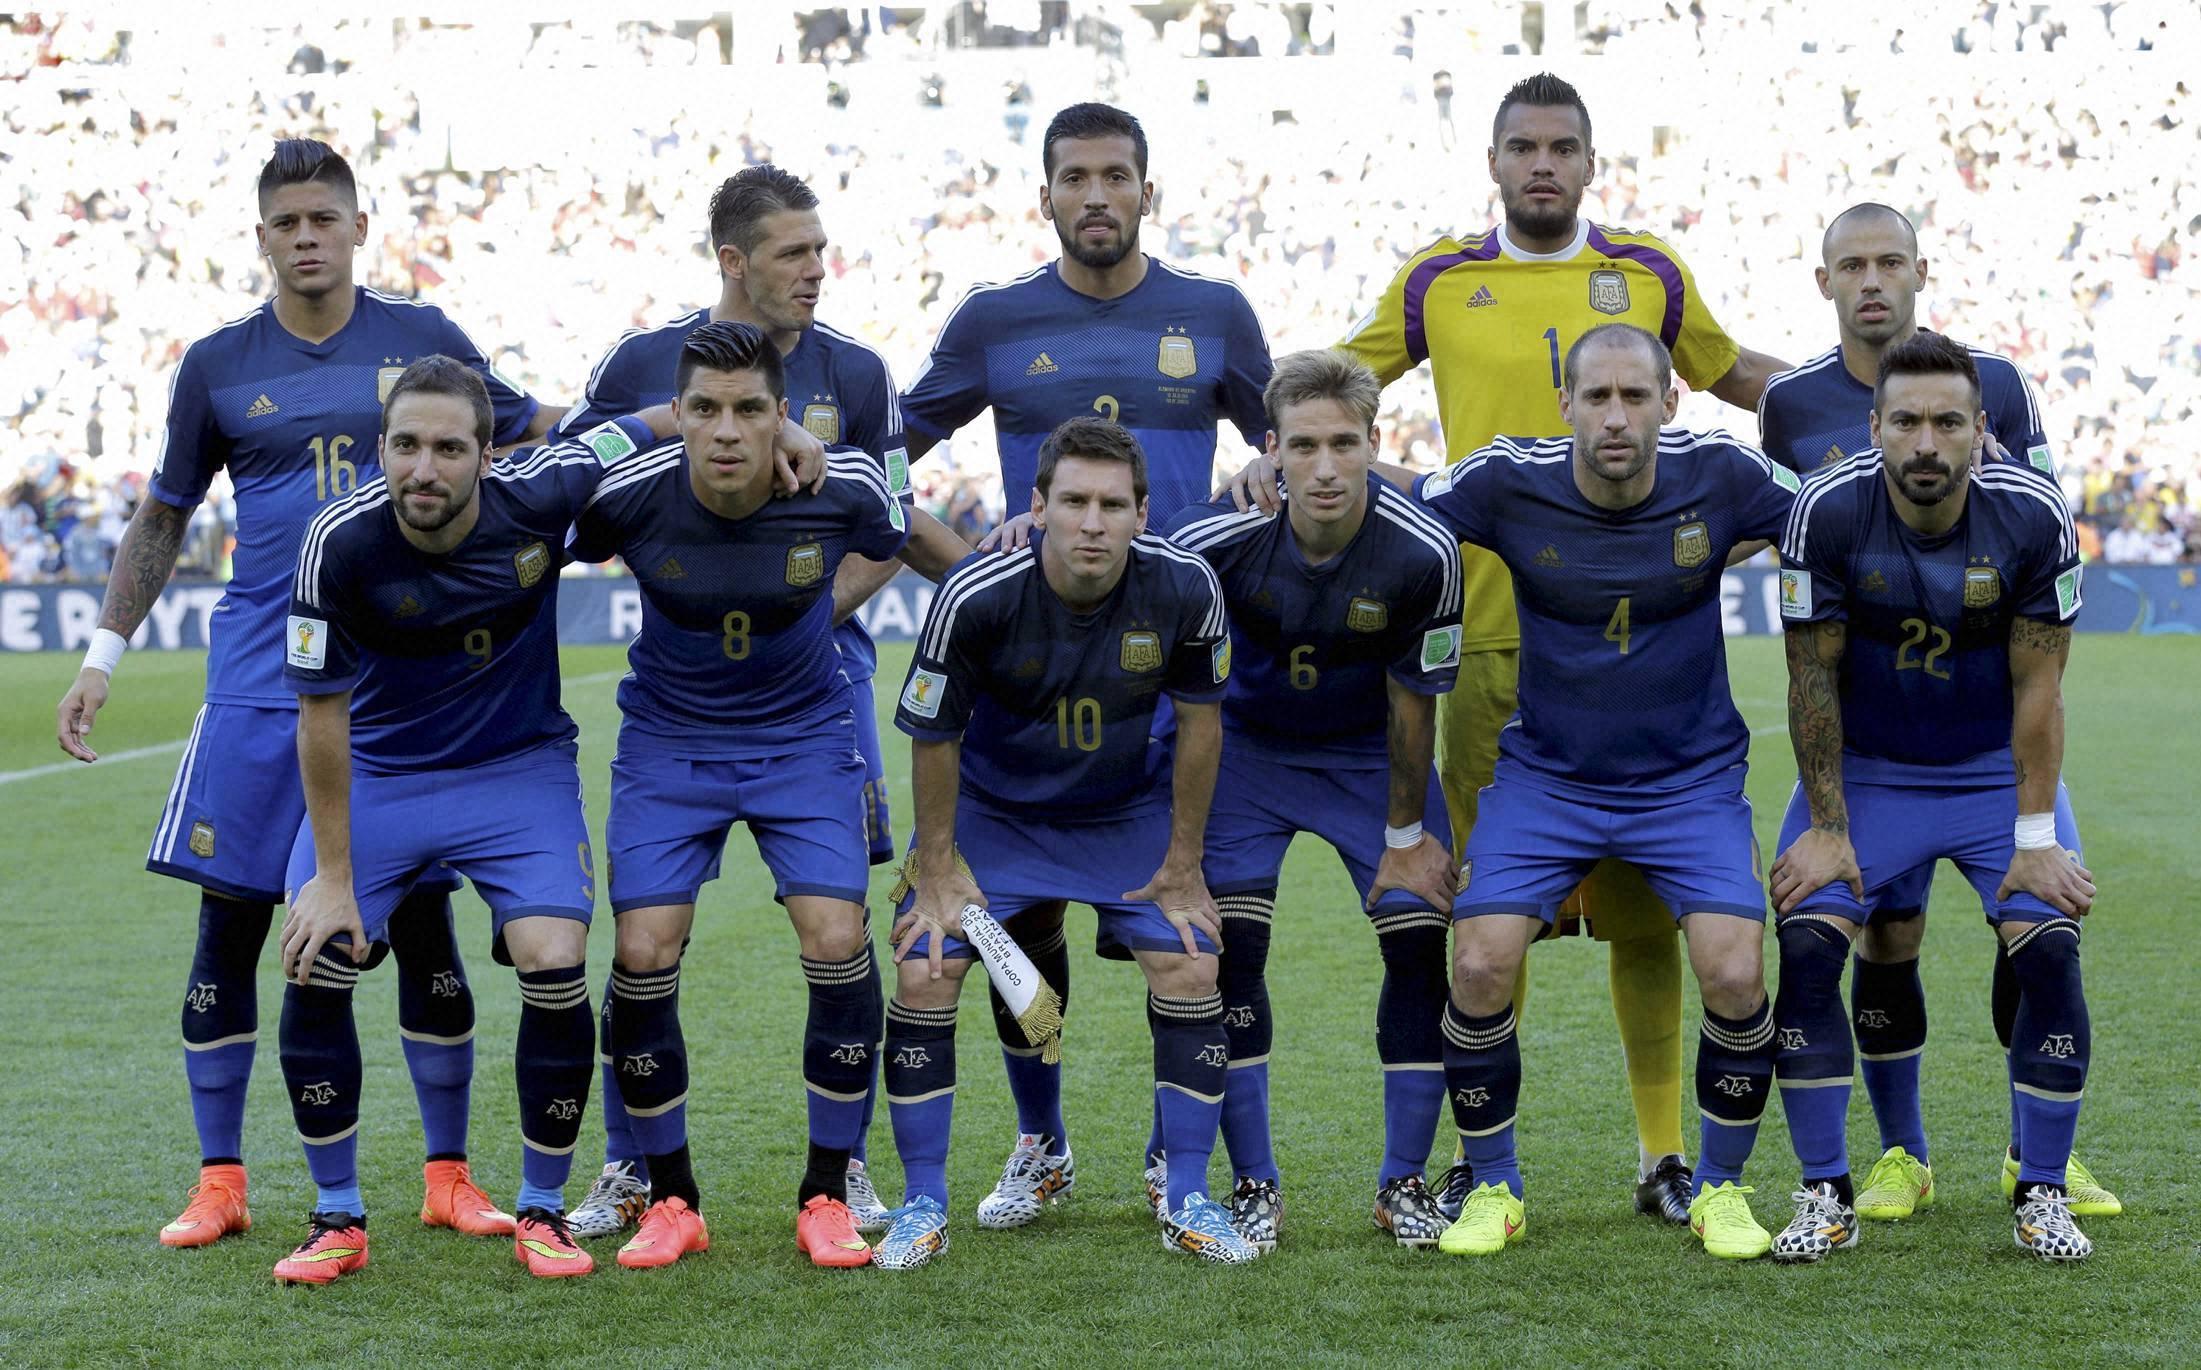 World Cup final, soccer, match, Germany, Argentina, Maracana Stadium, Rio de Janeiro, Brazil